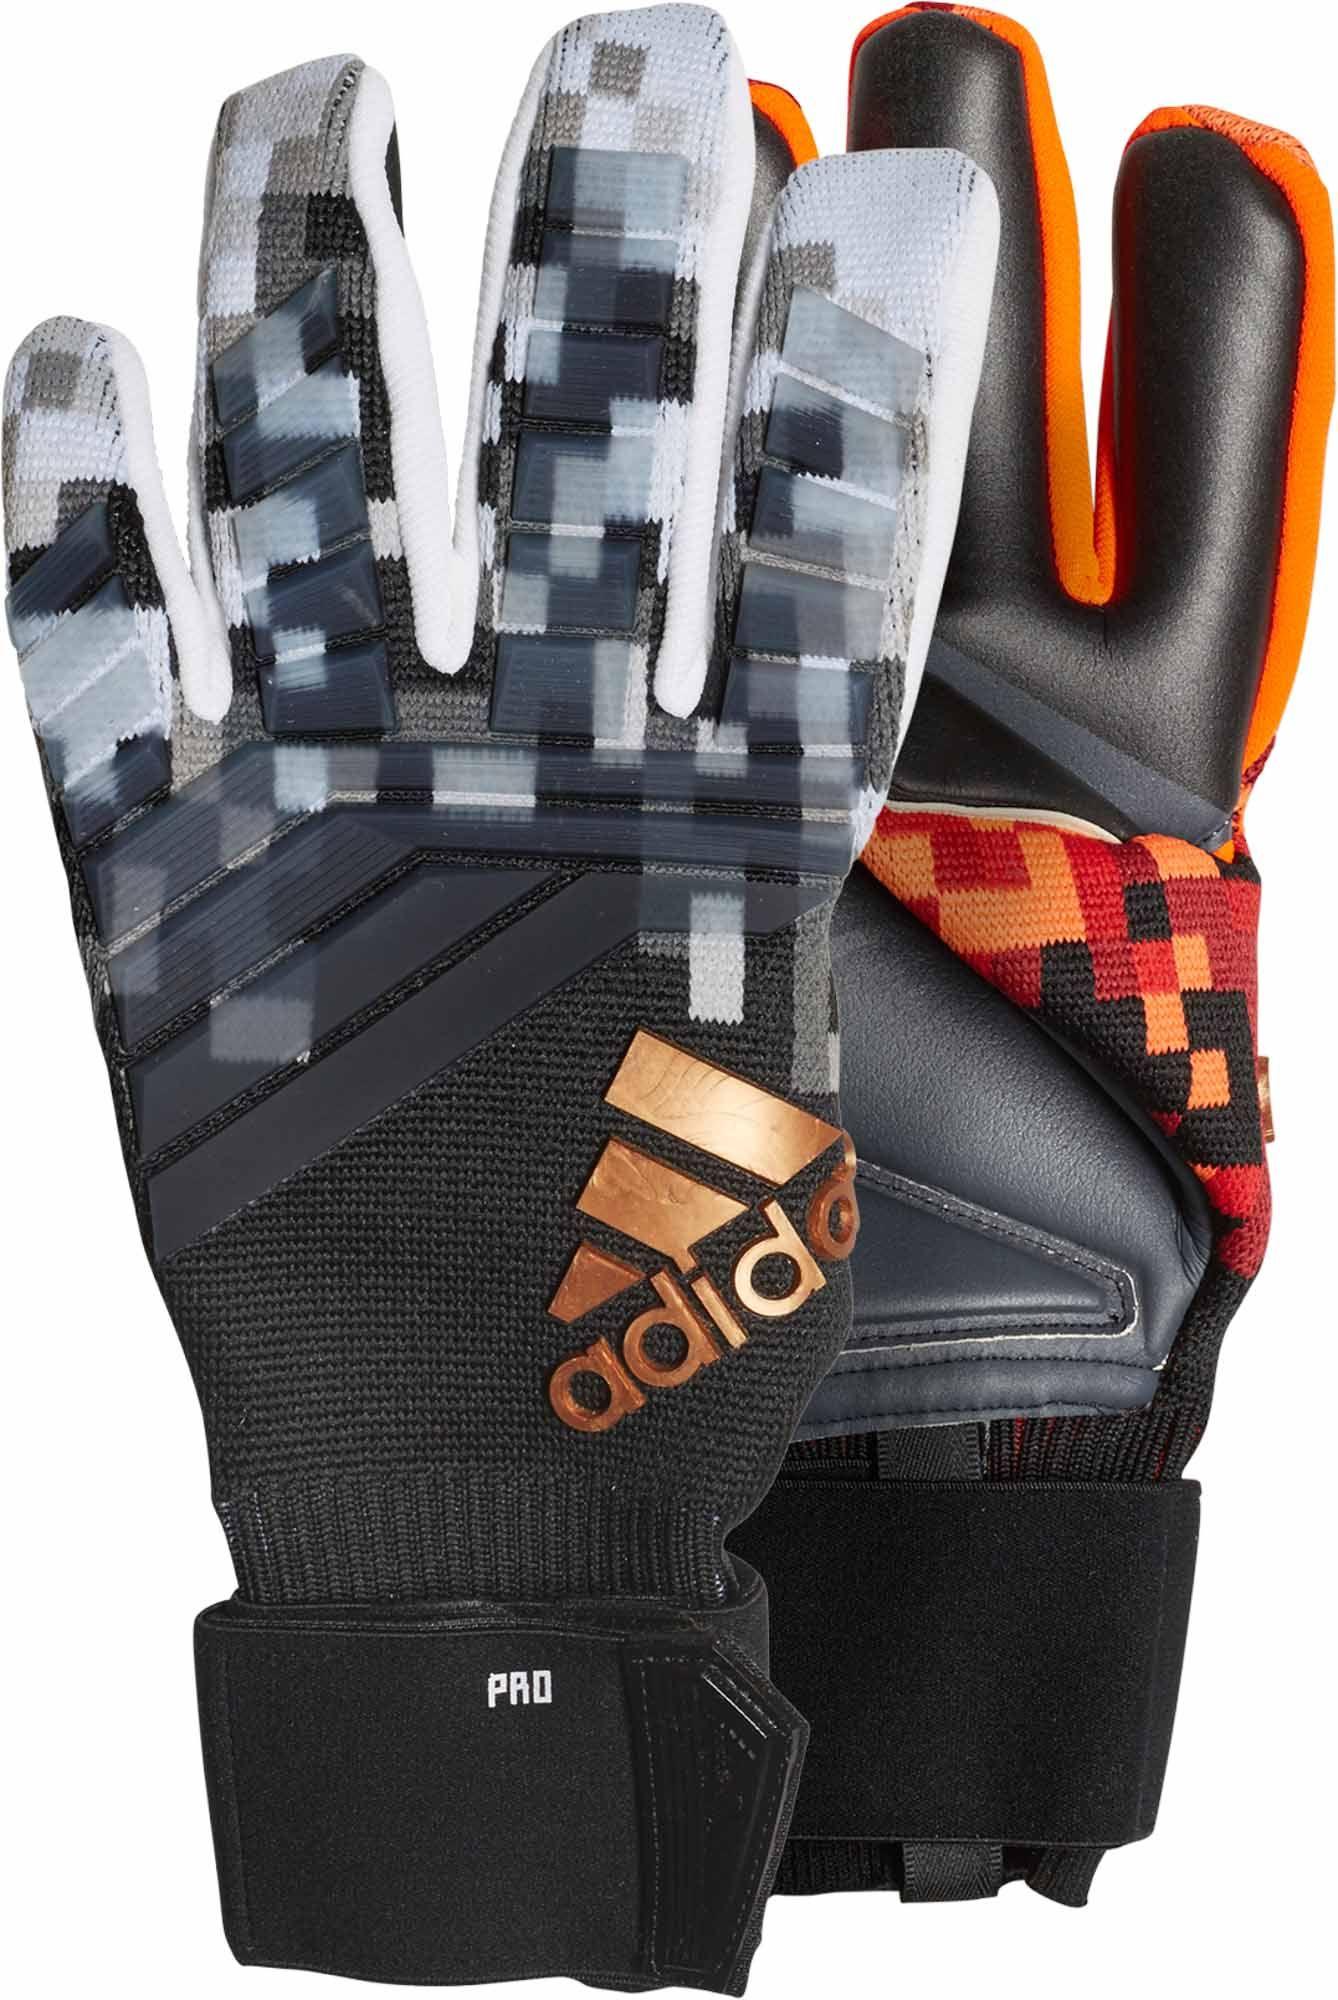 Adidas Predator World Cup Goalkeeper Gloves Red Black Soccerpro Goalie Gloves Goalkeeper Gloves Goalkeeper